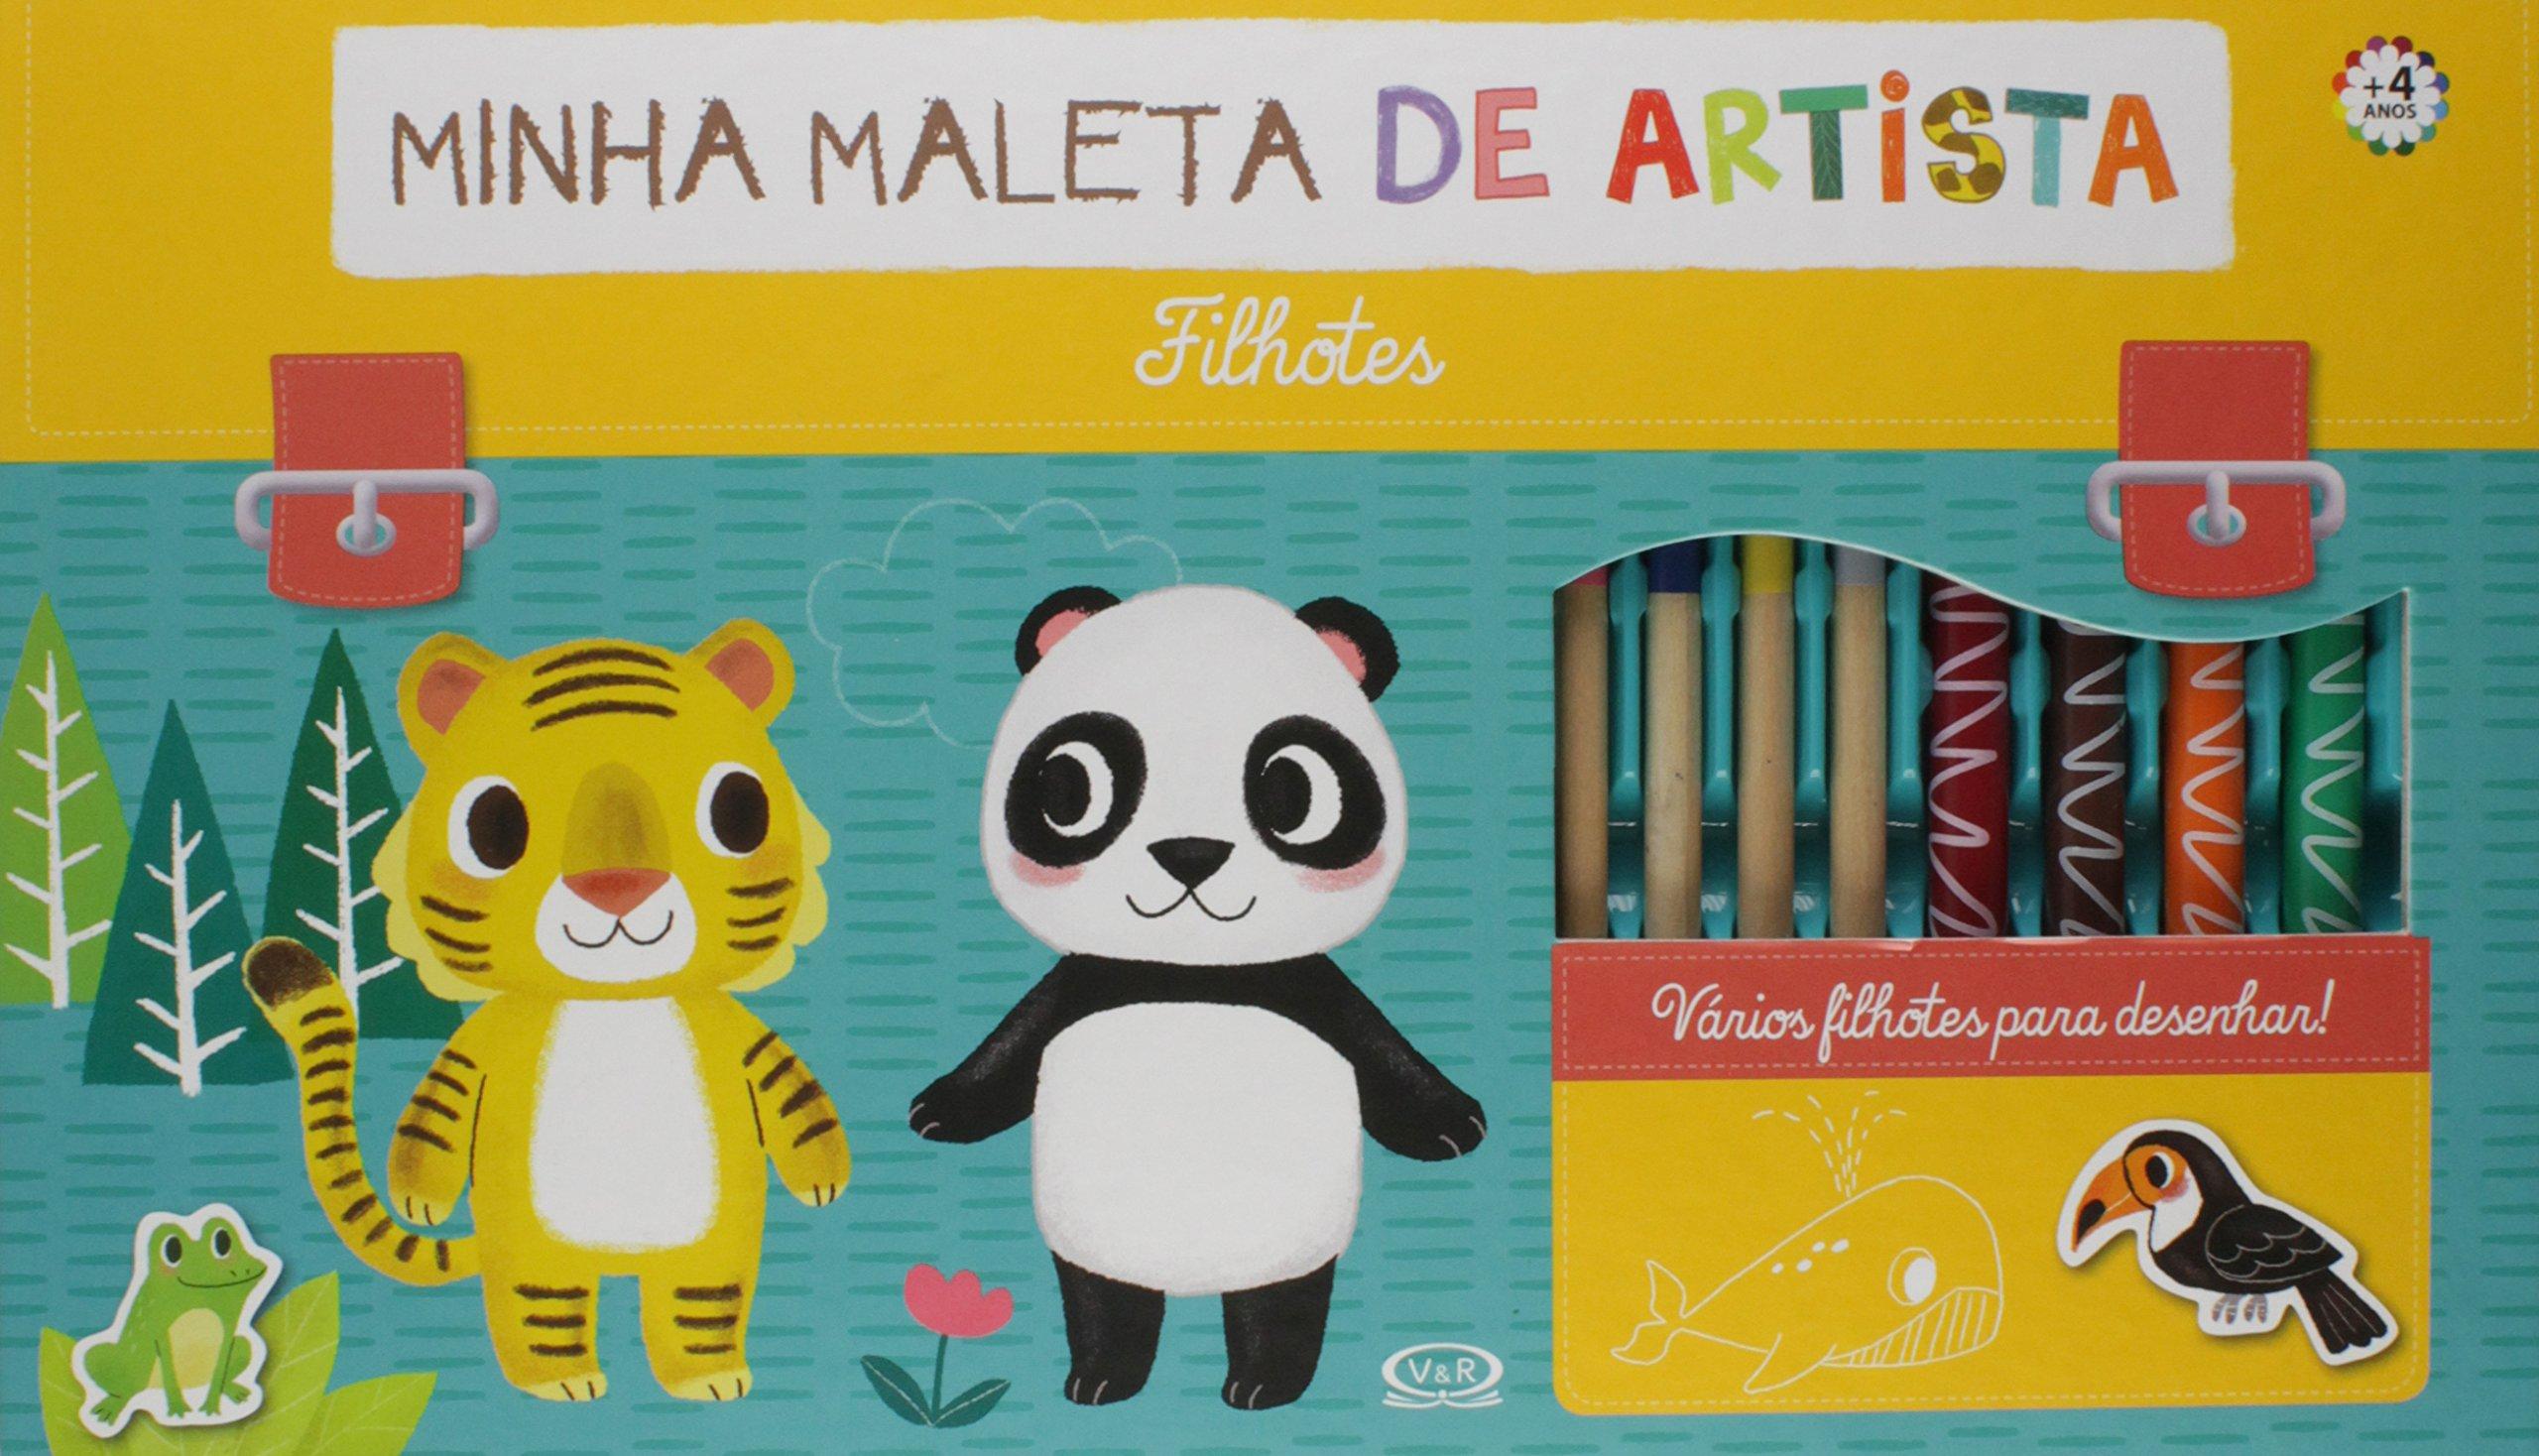 Minha Maleta de Artista. Filhotes (Em Portuguese do Brasil) (Portuguese Brazilian) Book Supplement – 2016